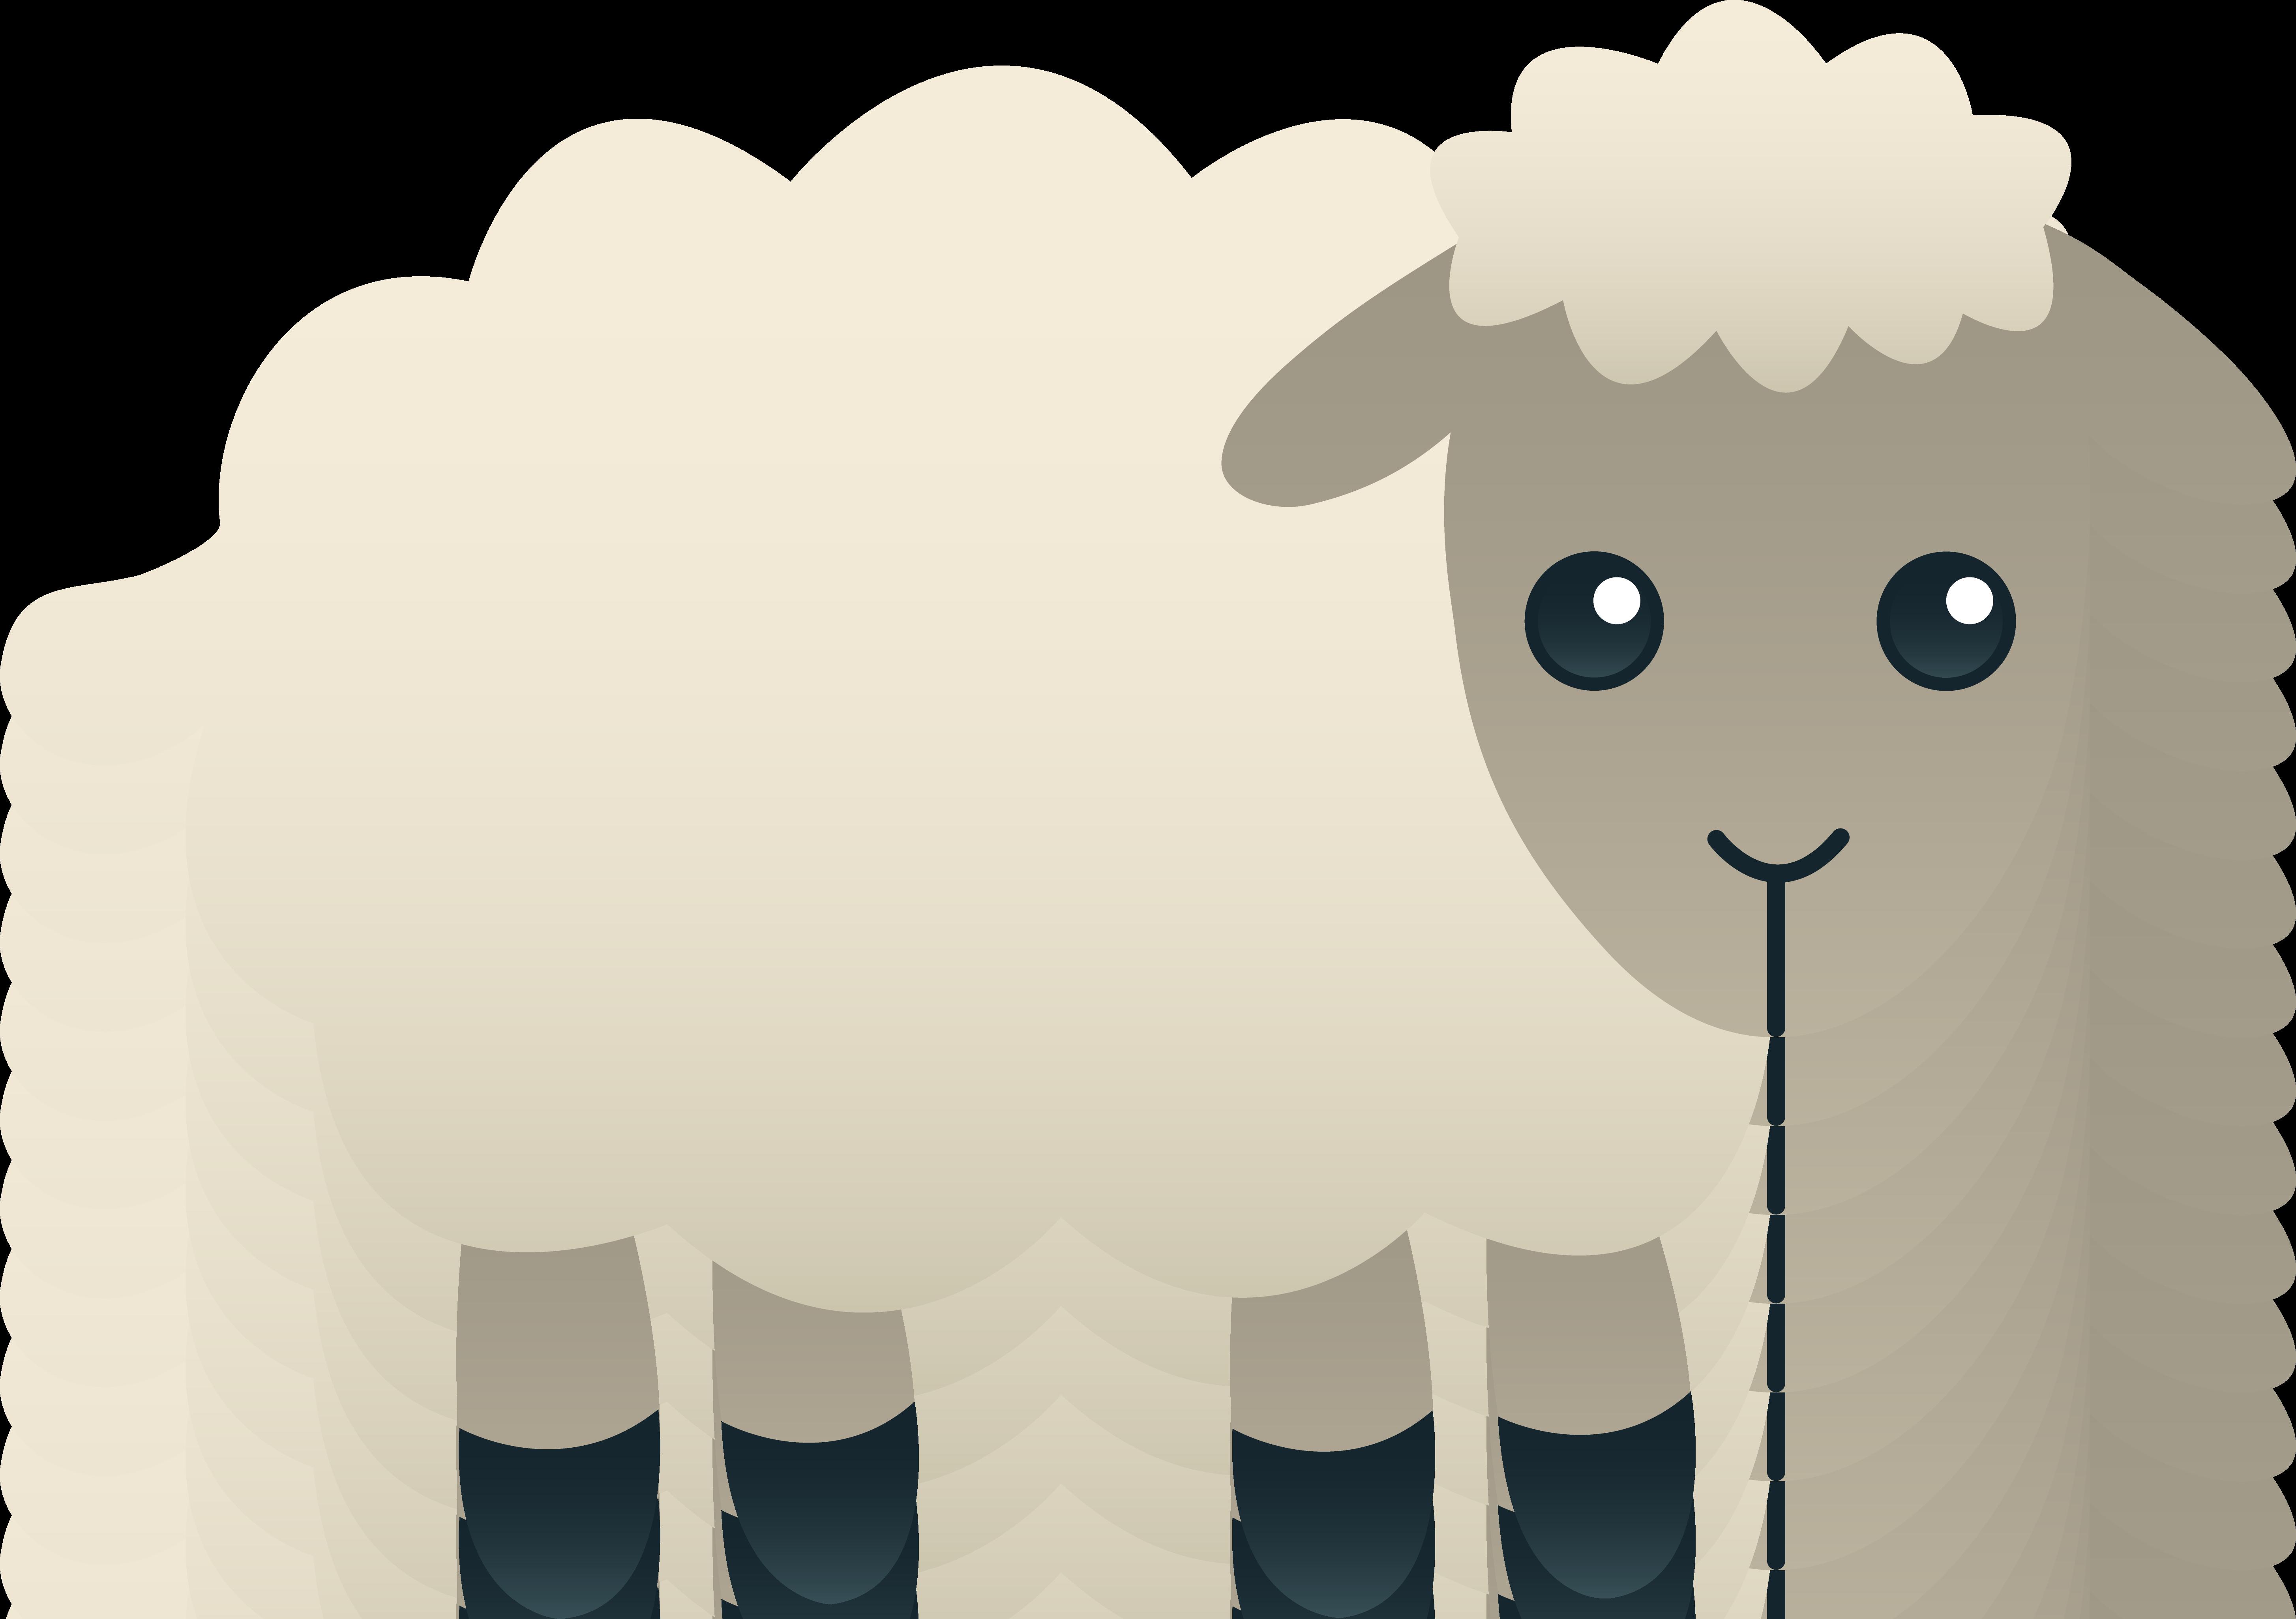 Lamb clipart bible shepherd. Fluffy white sheep aiti